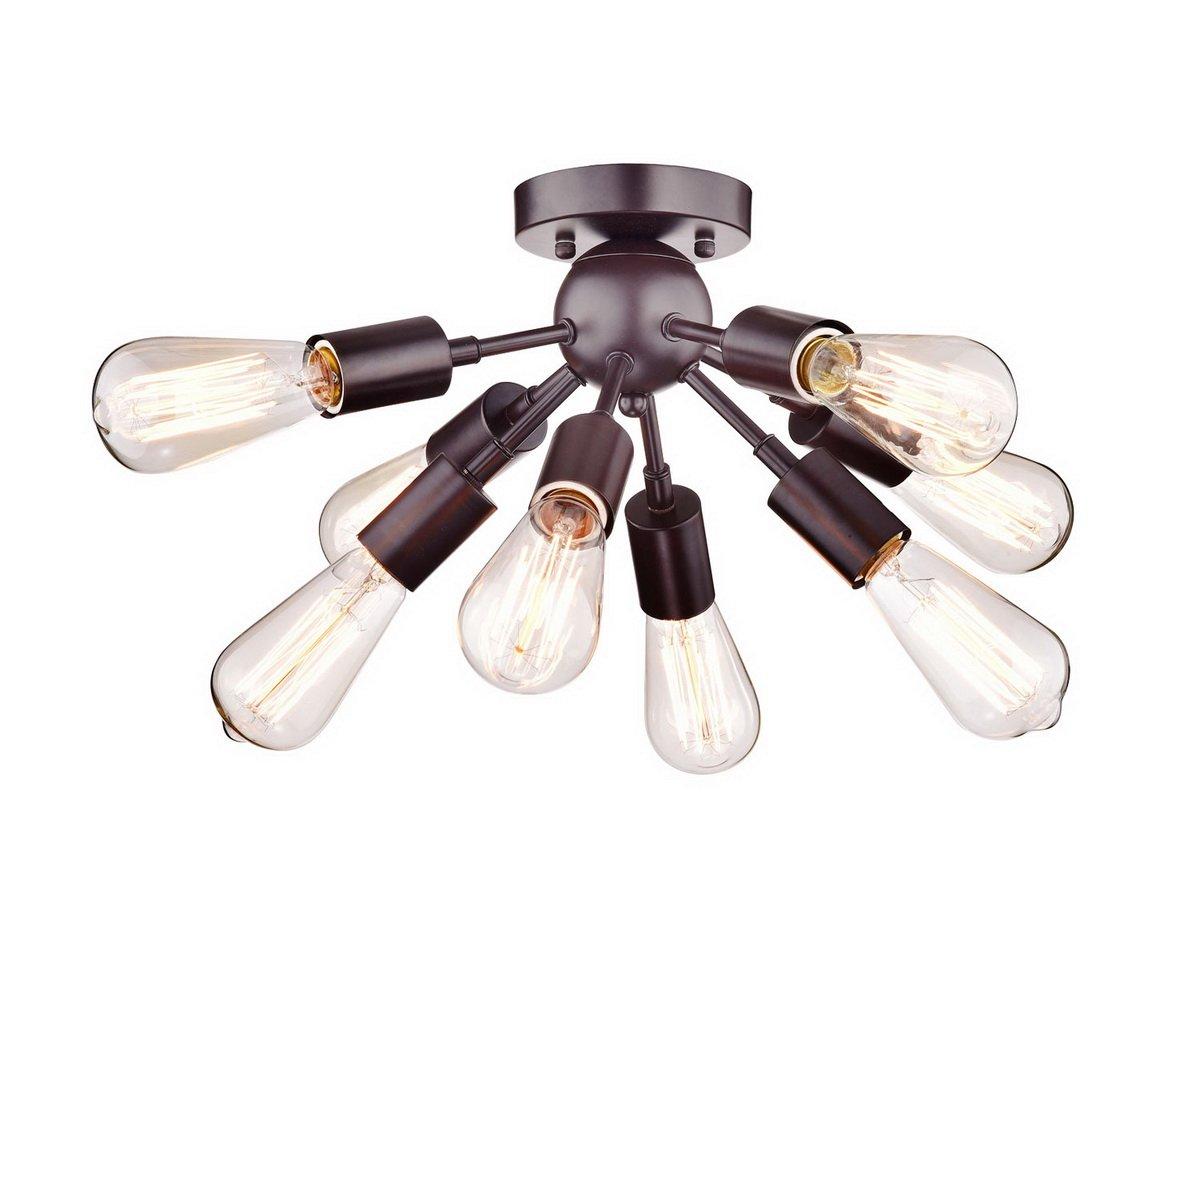 Dazhuan Vintage Antique Metal Orb Sputnik Chandeliers 8 Lights Semi Flush Mount Pendant Ceiling Light Lamp Fixture With Bulb Sockets Com